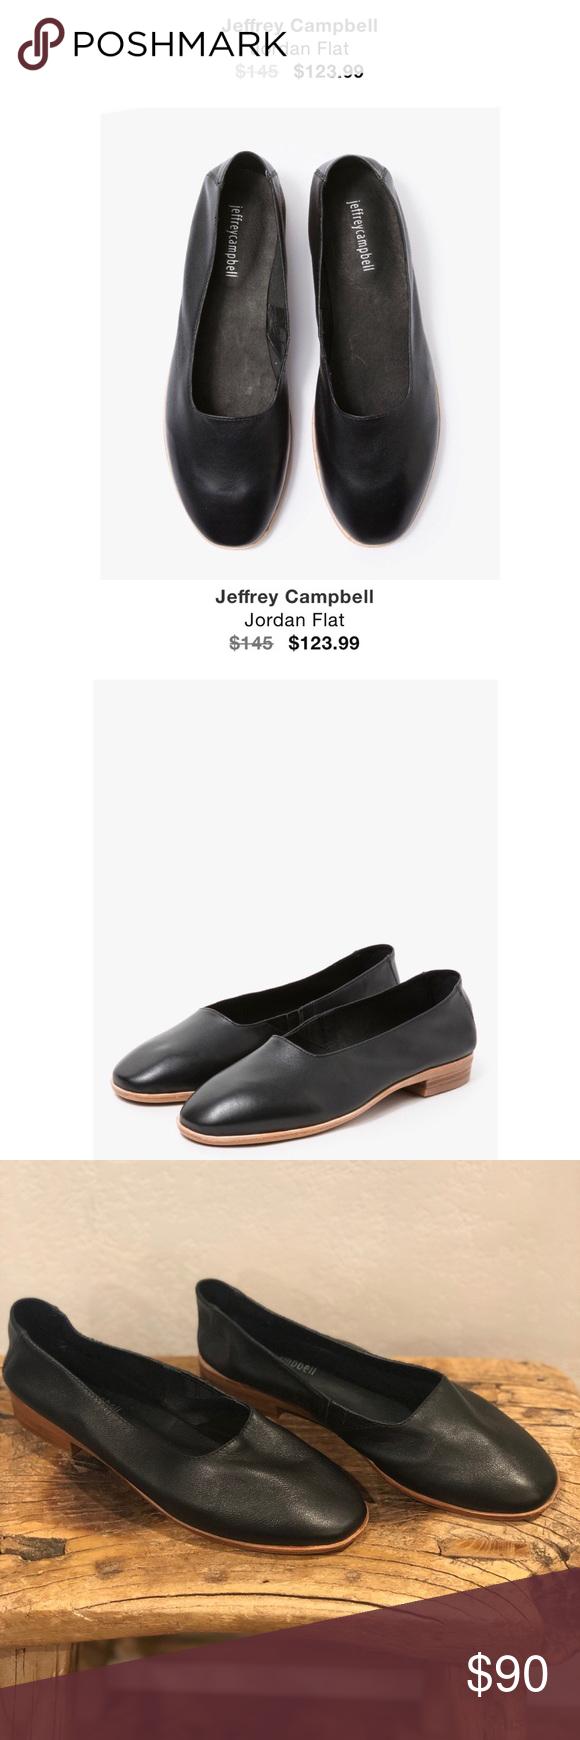 jeffrey campbell website